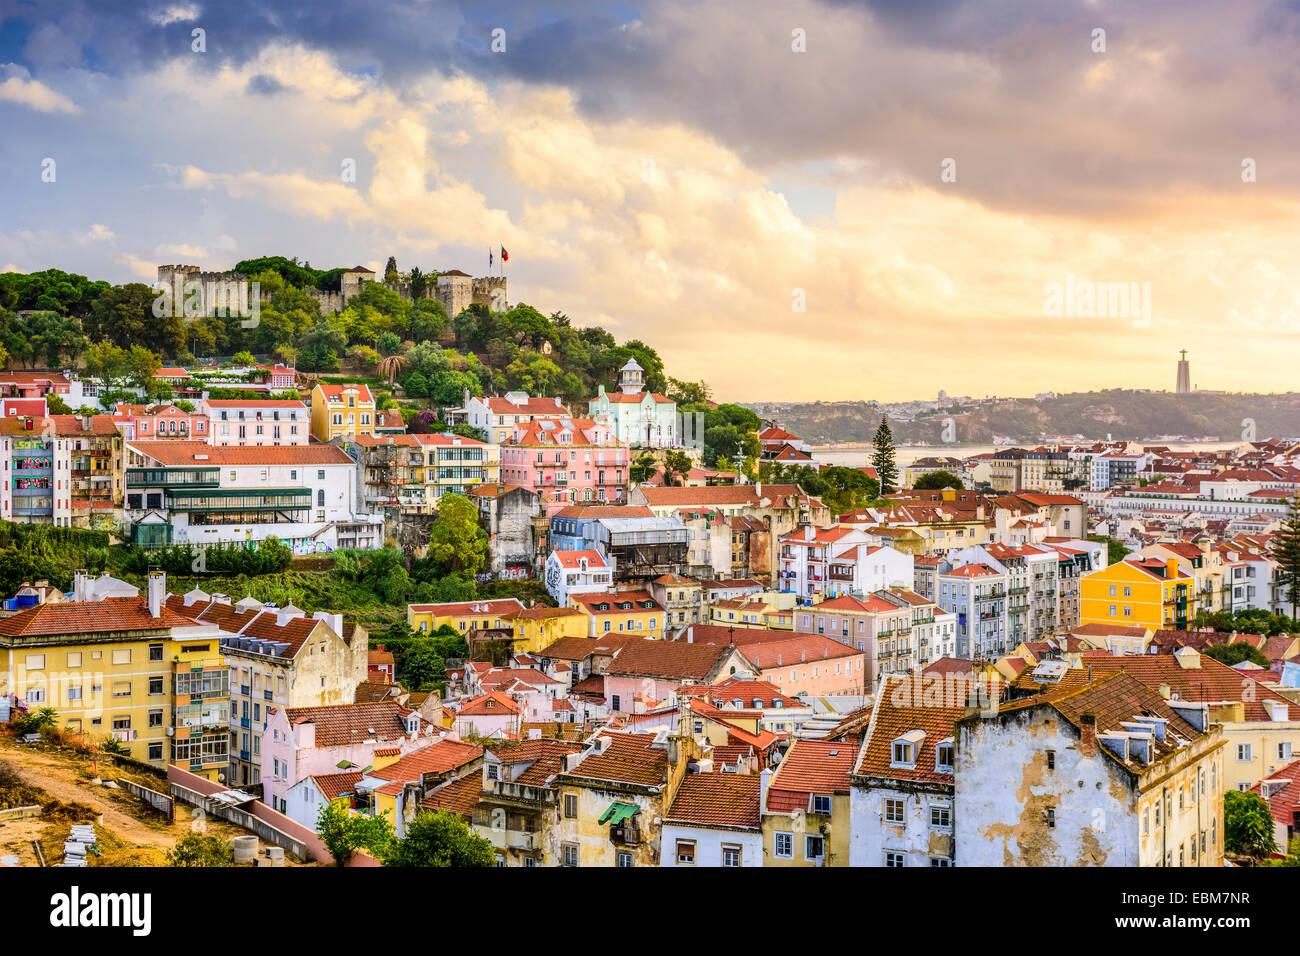 Lisbon, Portugal skyline at Sao Jorge Castle at dusk. - Stock Image